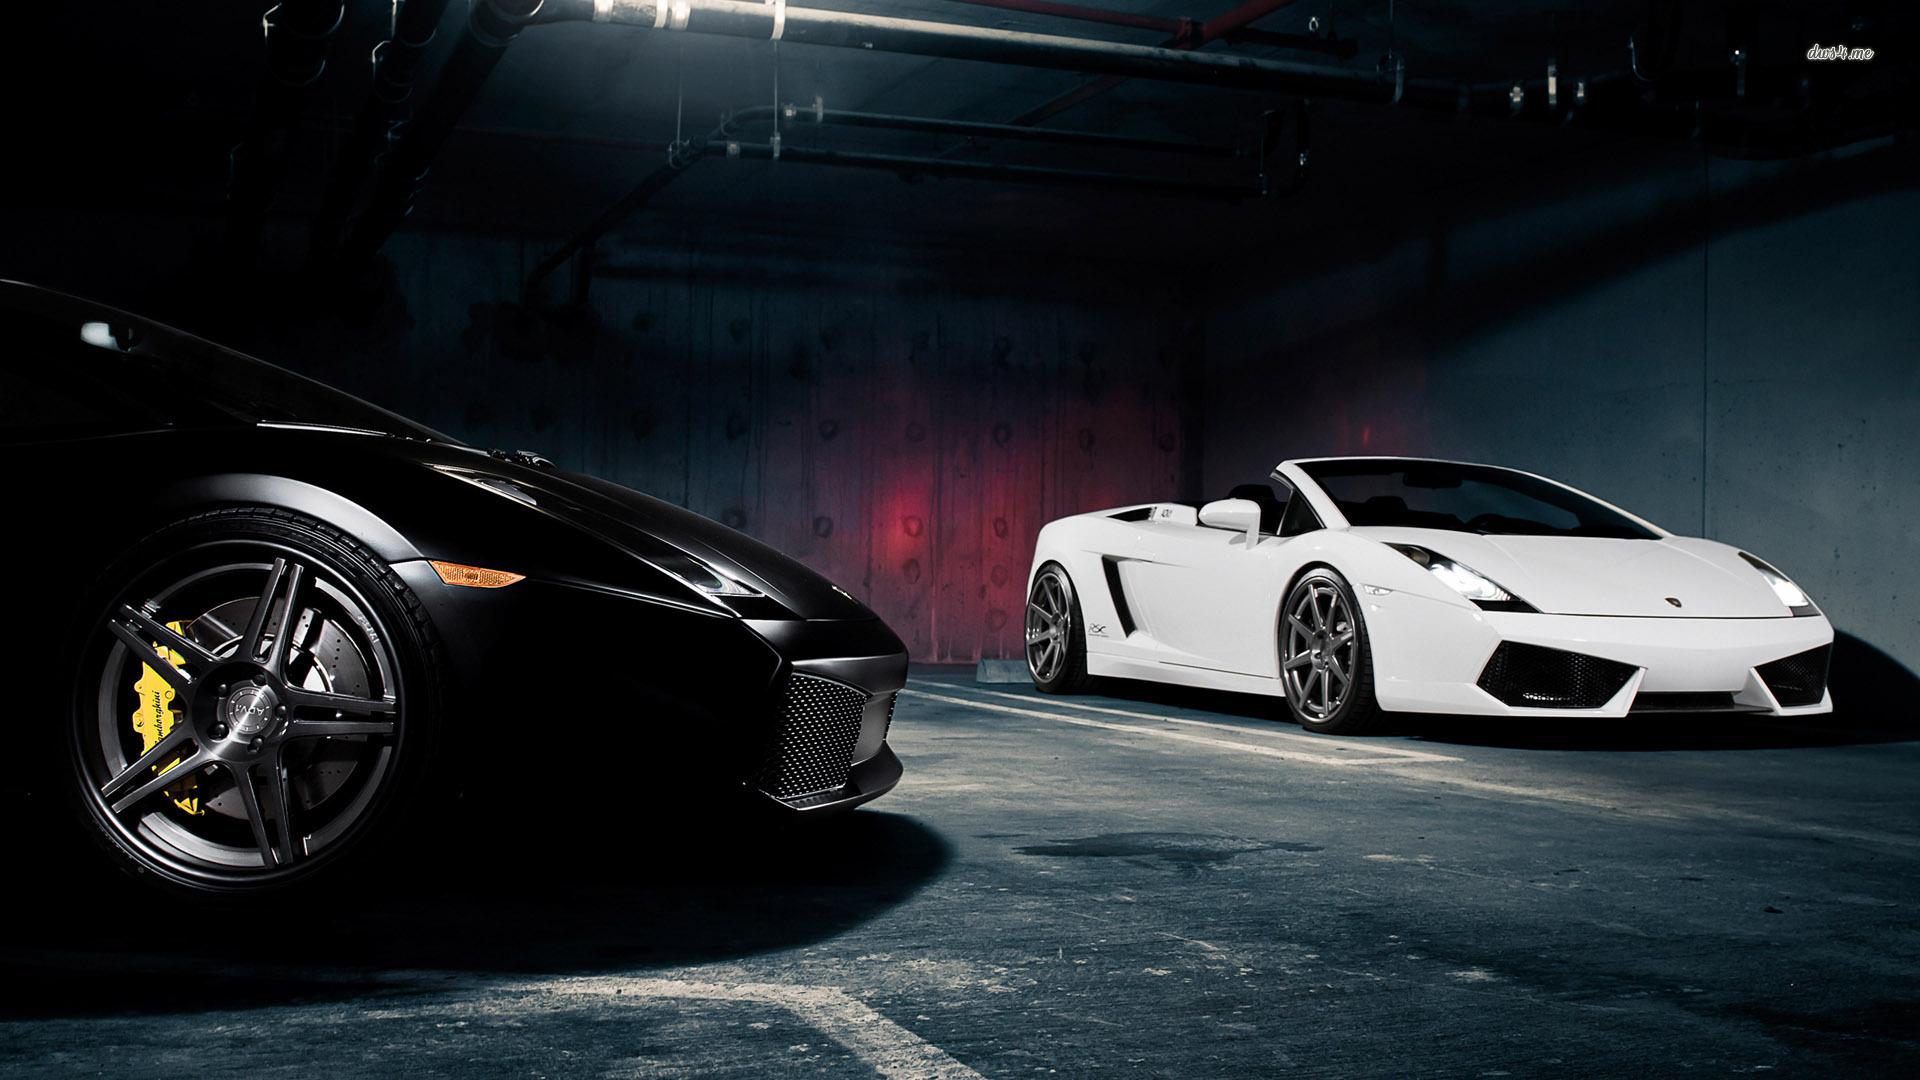 Lamborghini Sports Cars Black HD Wallpaper